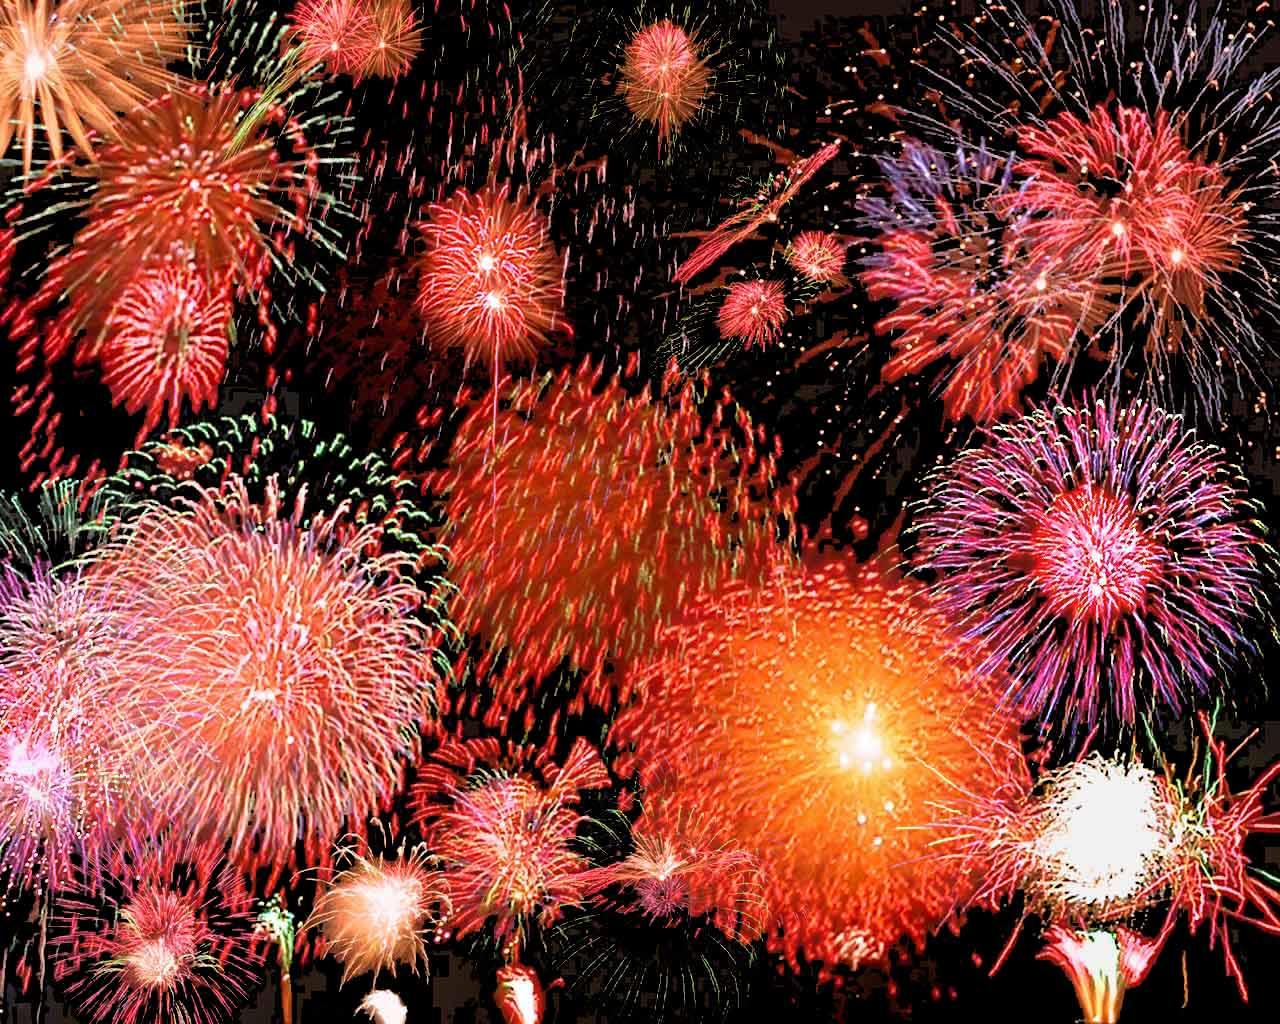 http://theevanstonian.files.wordpress.com/2011/07/fireworks11.jpg